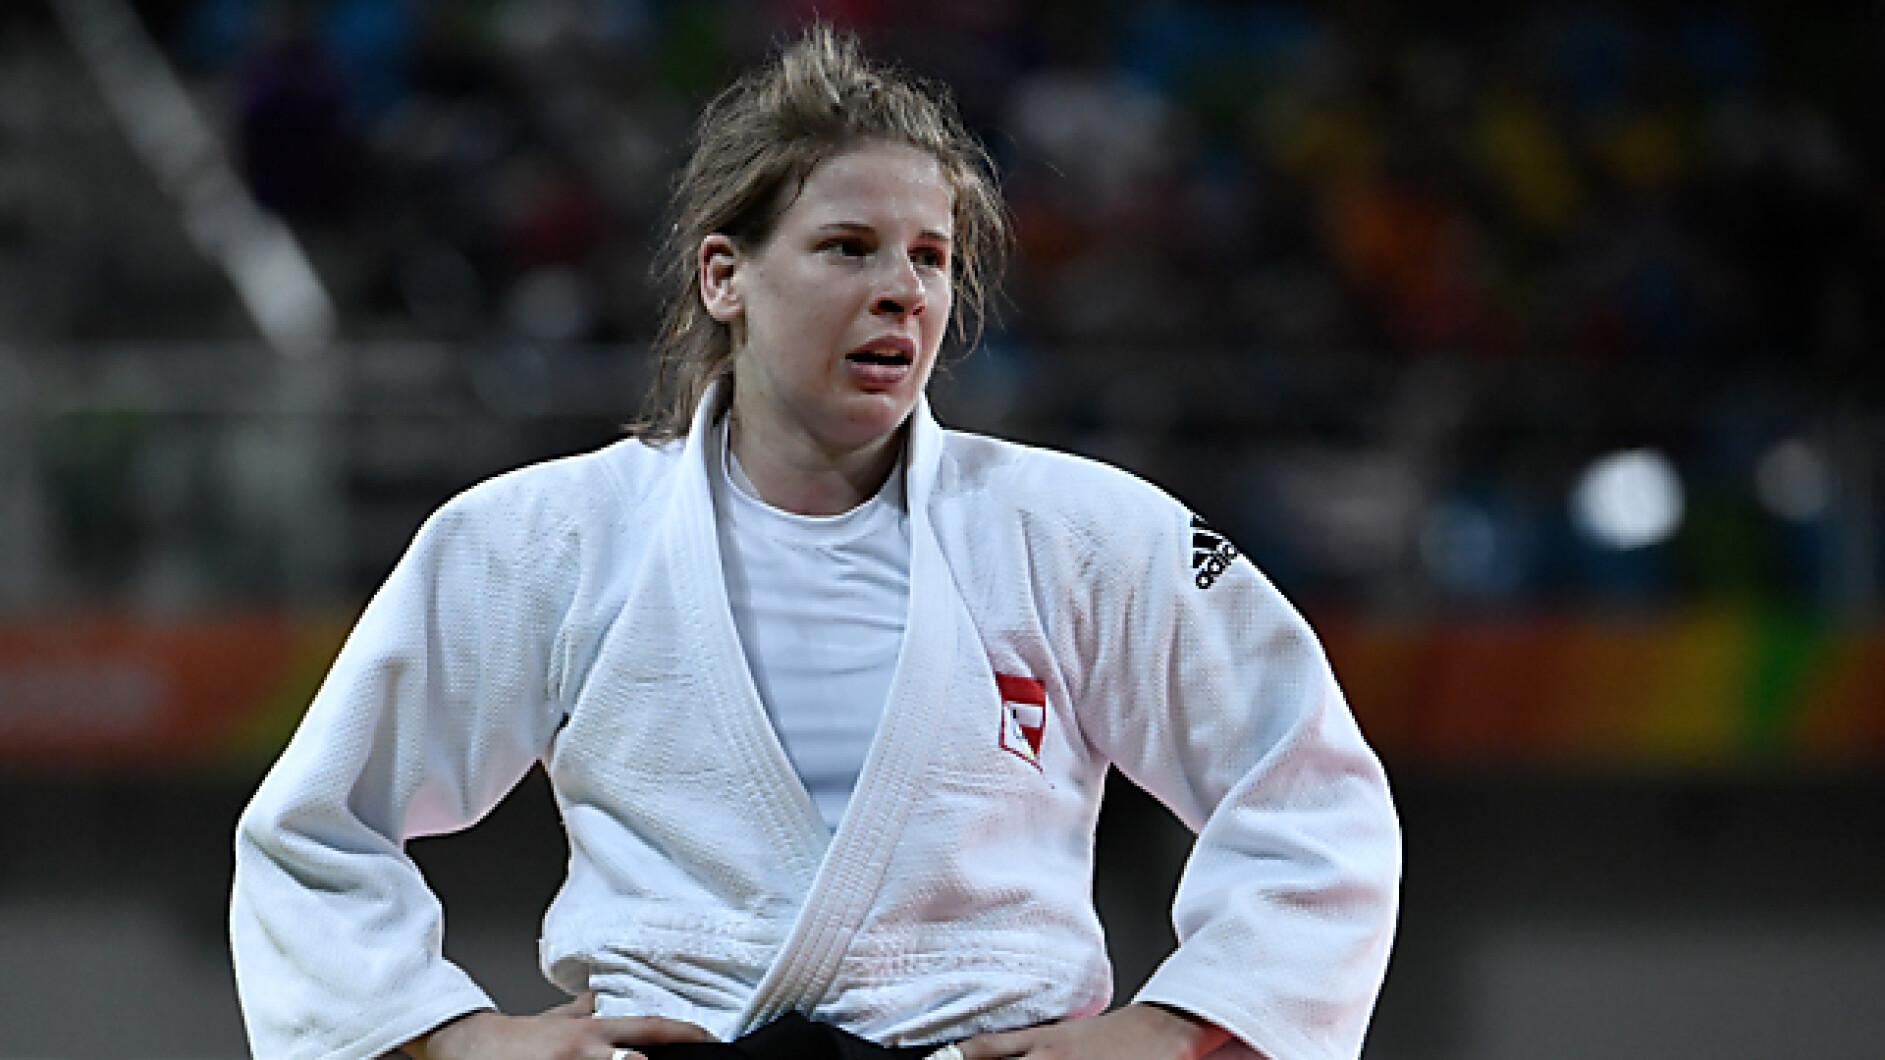 Judo-Judoka-Bernadette-Graf-holt-in-Lissabon-EM-Bronze